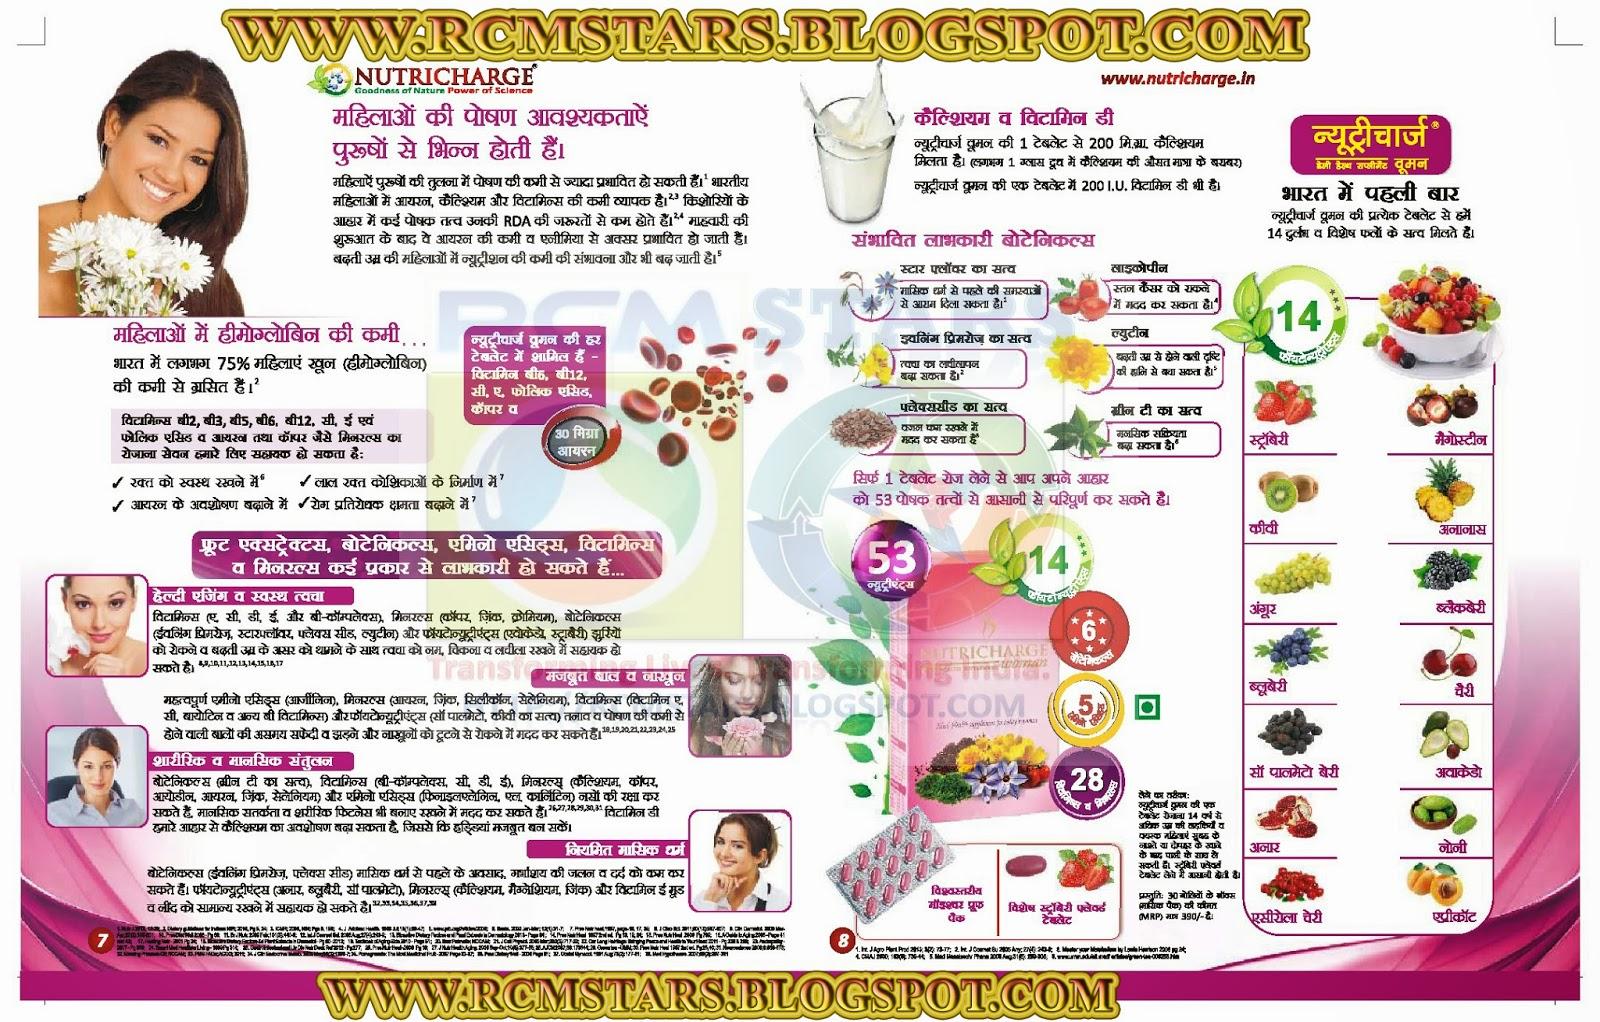 rcm business plan in hindi 2014 full